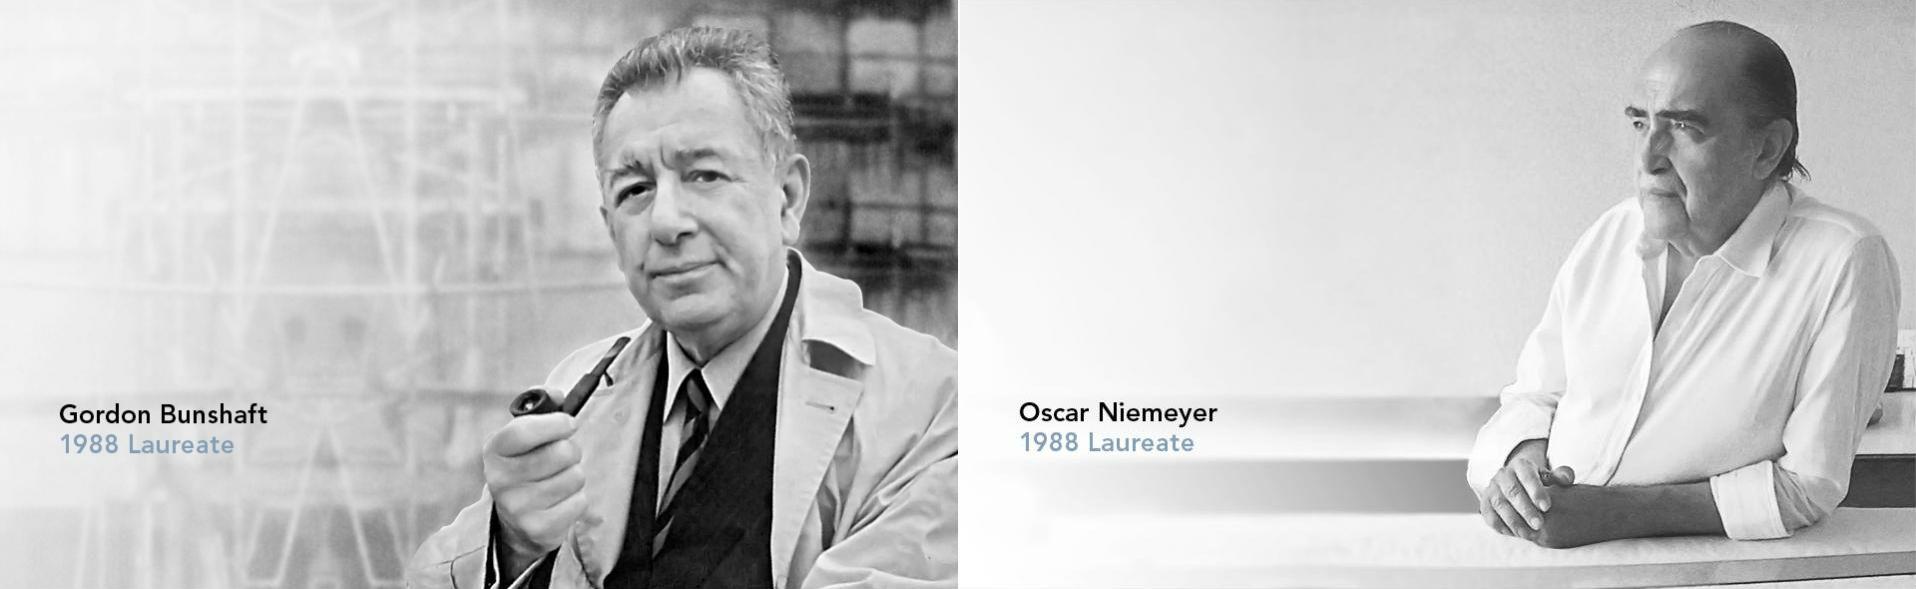 1988b-p-lg Bunshaft Niemeyer 2